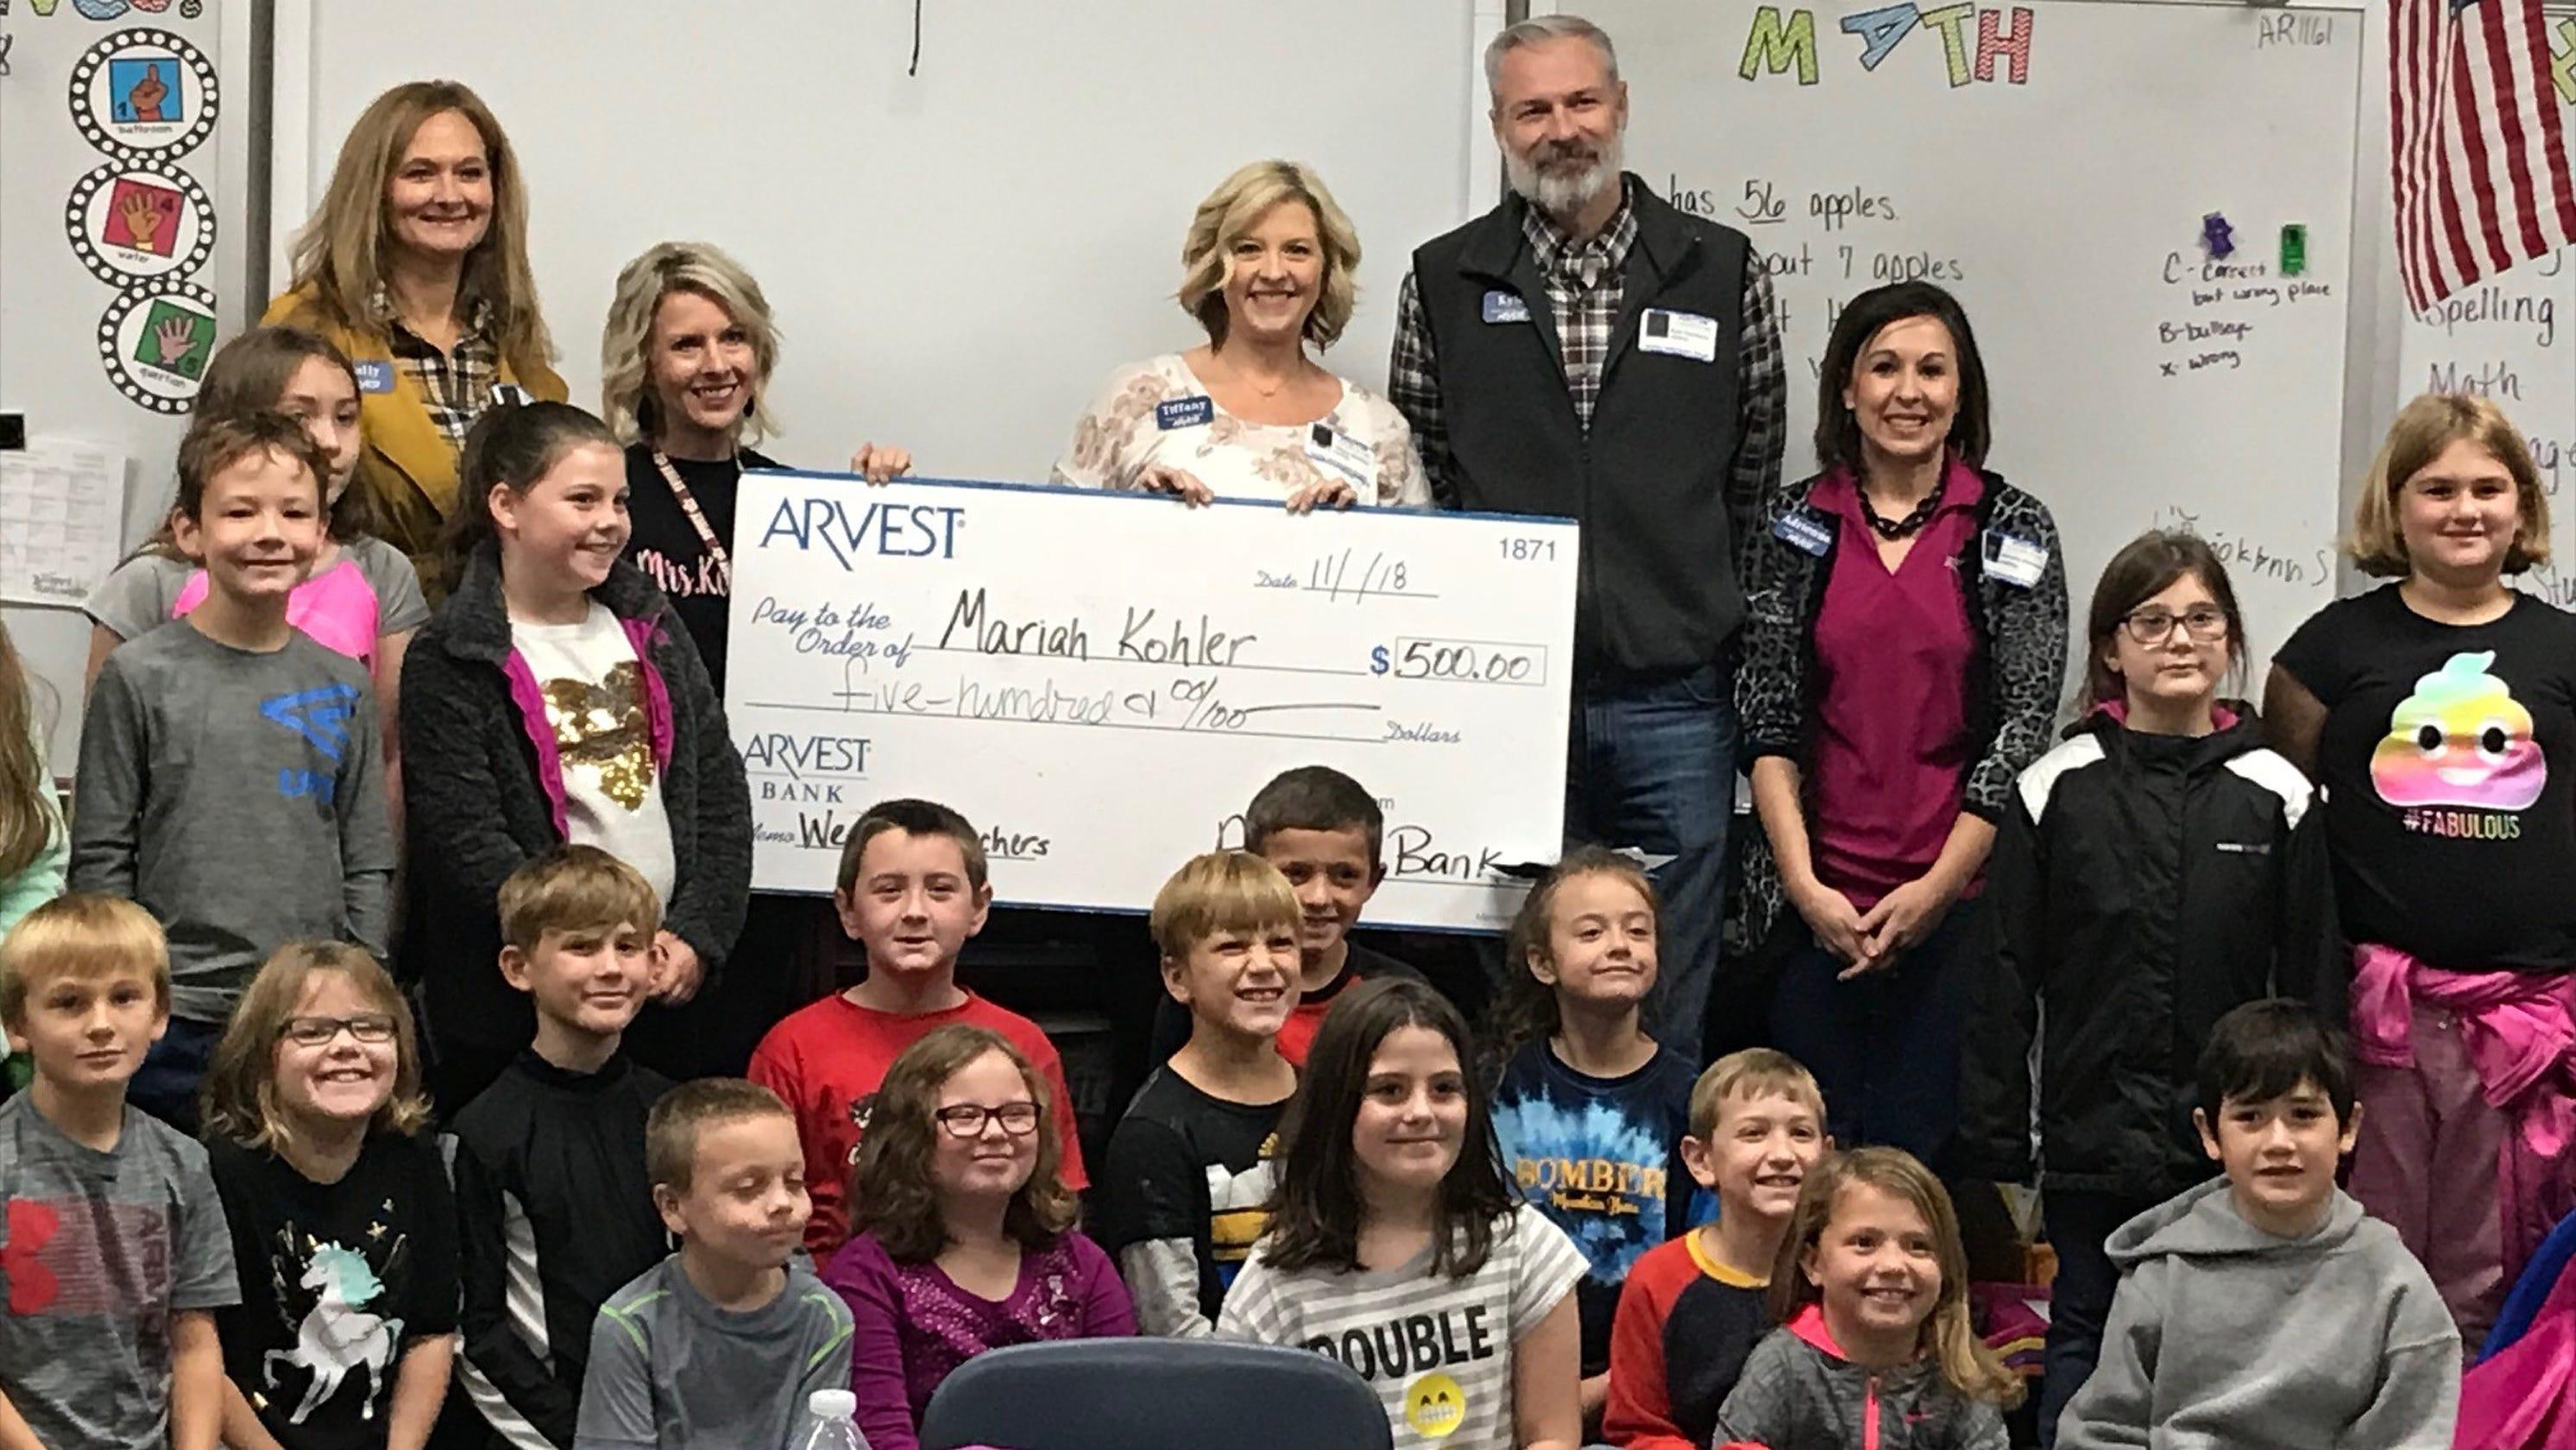 Arvest Bank awards $500 to teacher at Hackler Intermediate